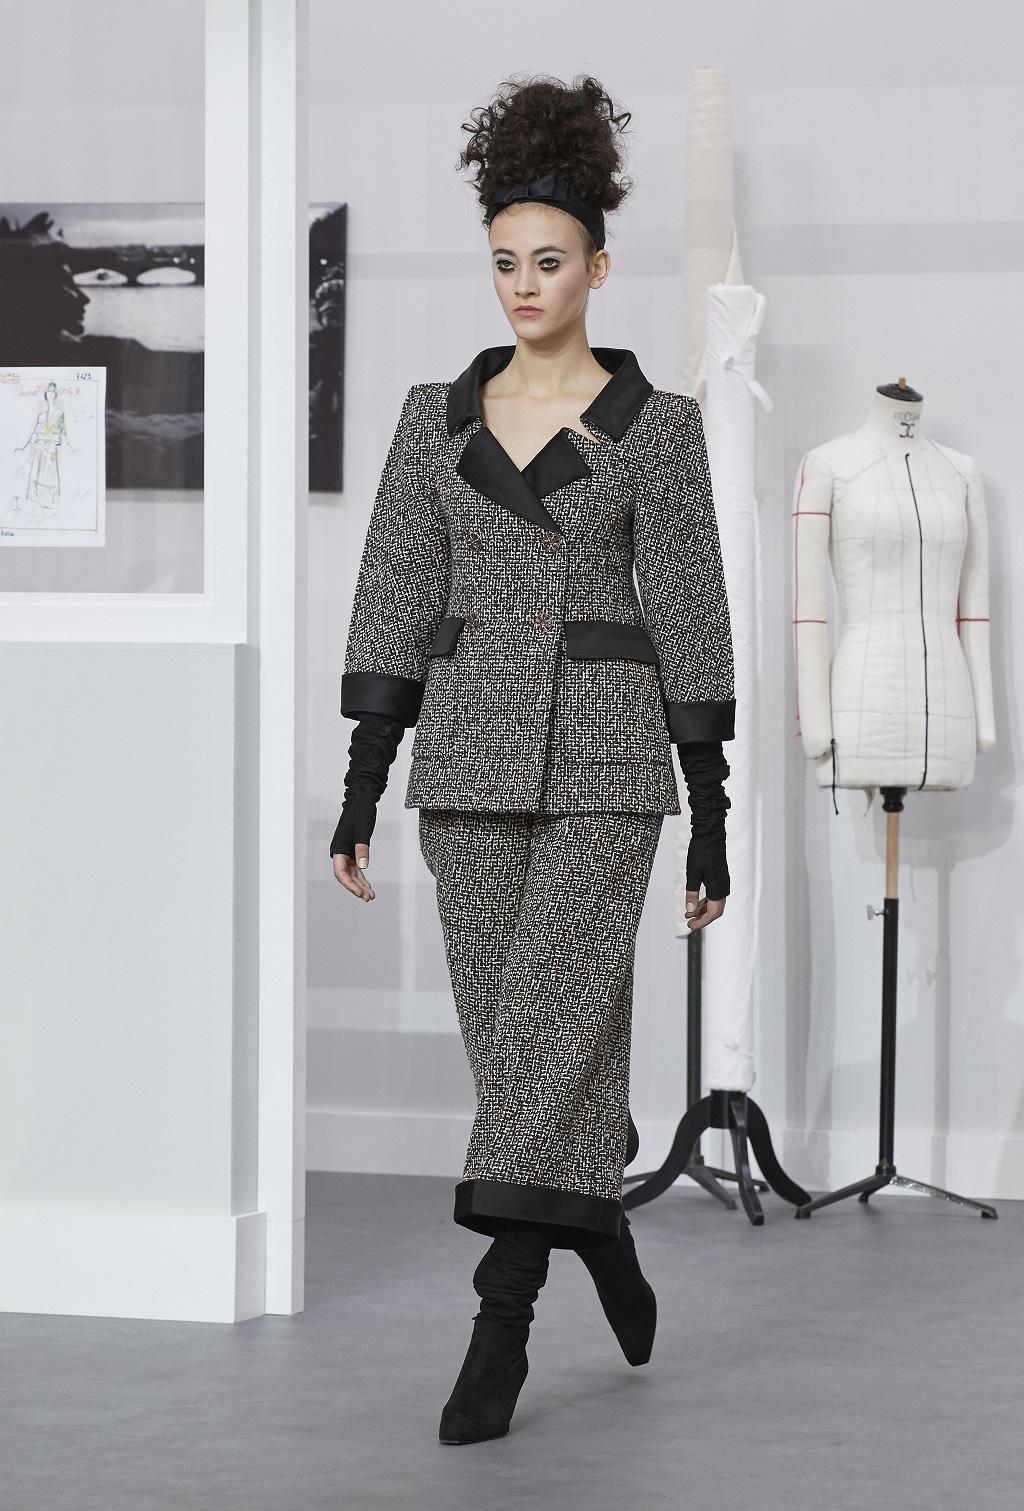 haute-couture 03